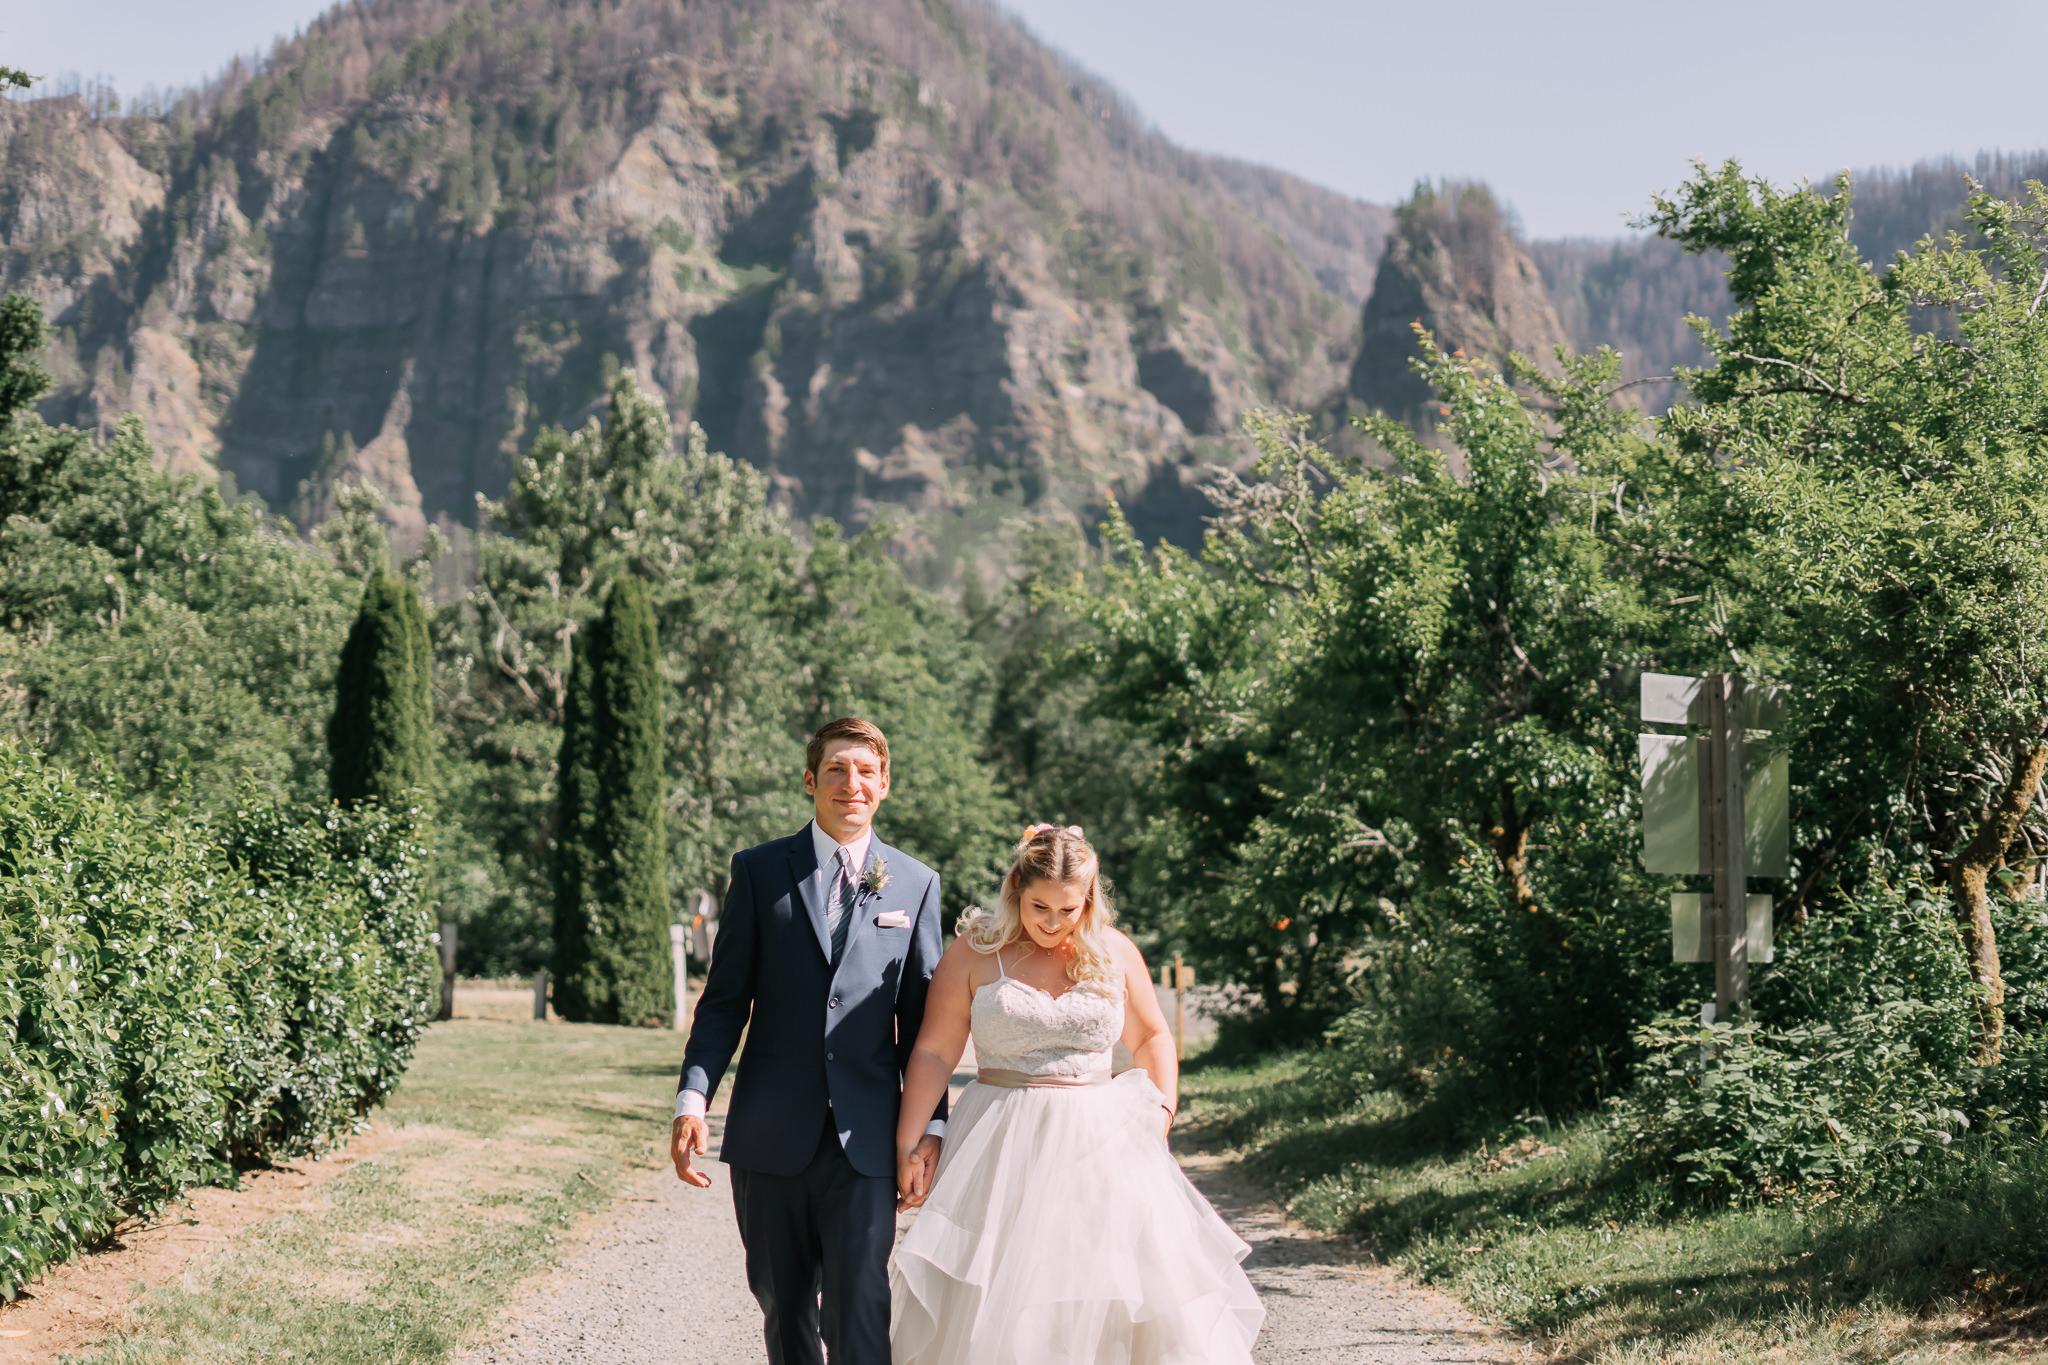 Wedding First Look Hug Kiss Columbia River Gorge Cliffside Cascade Locks walking